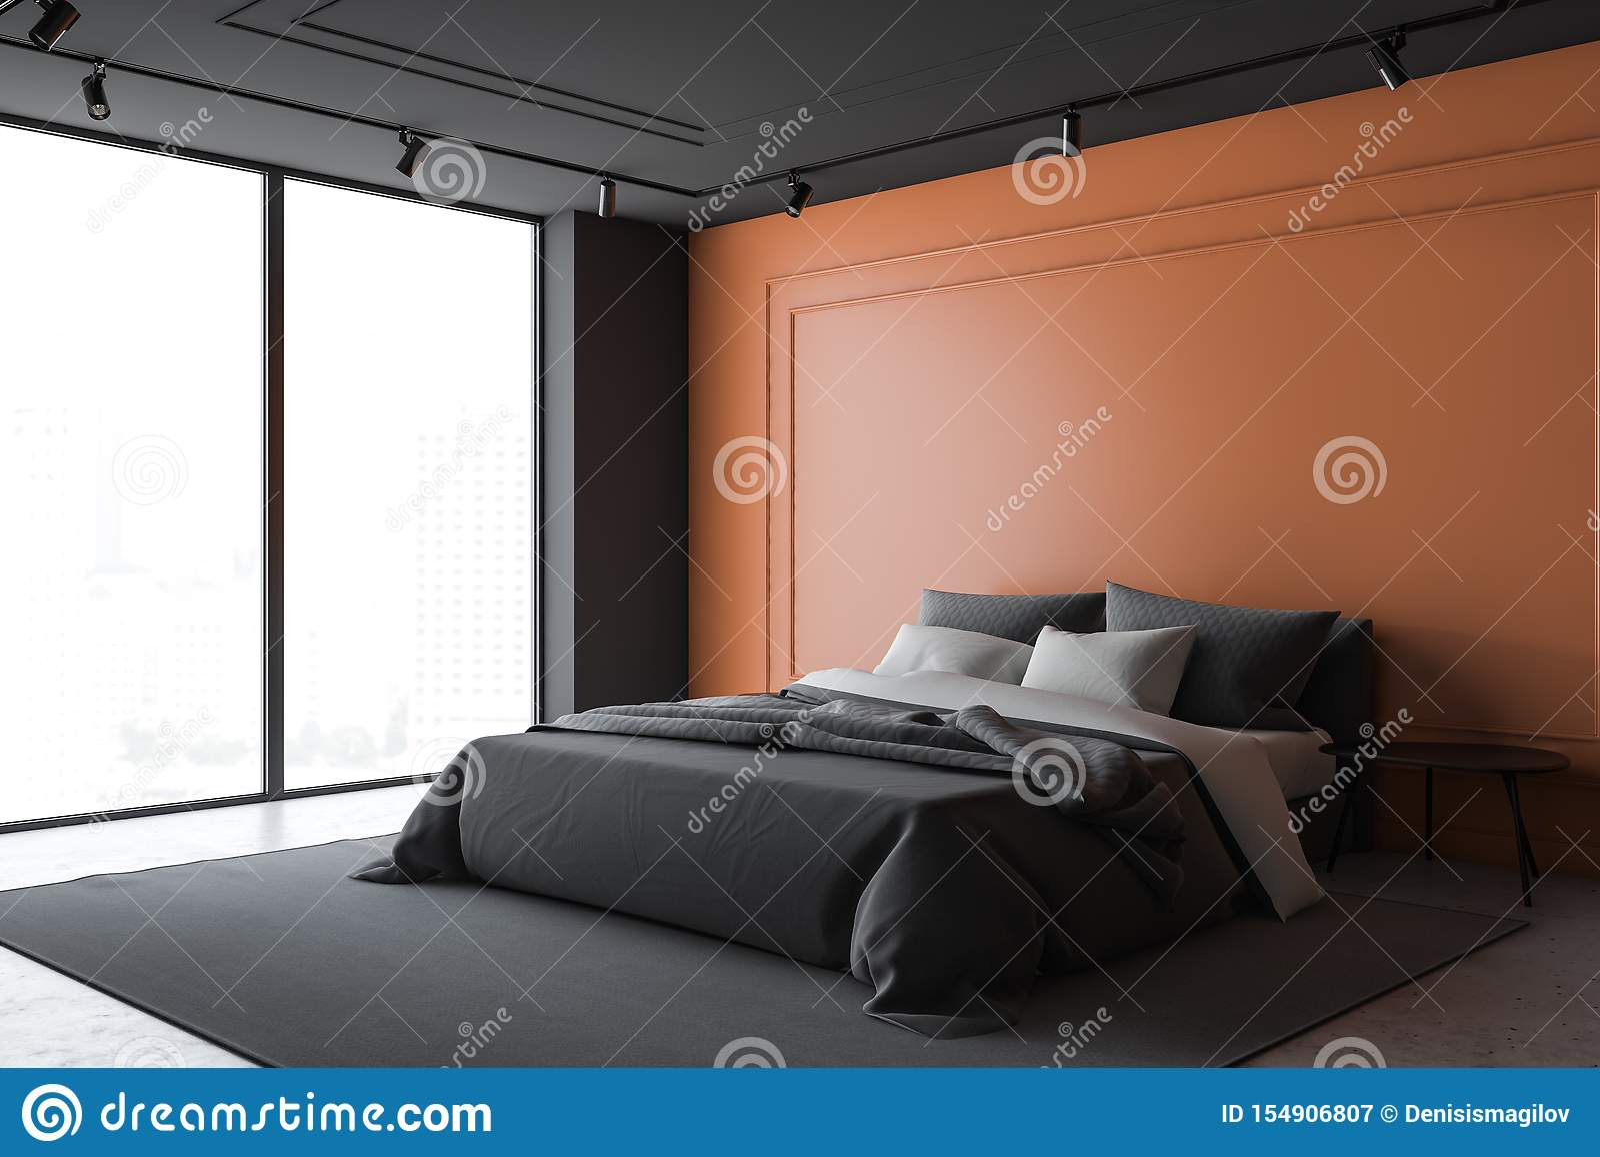 https www dreamstime com black orange master bedroom corner luxury walls concrete floor double bed standing gray carpet bedside table image154906807